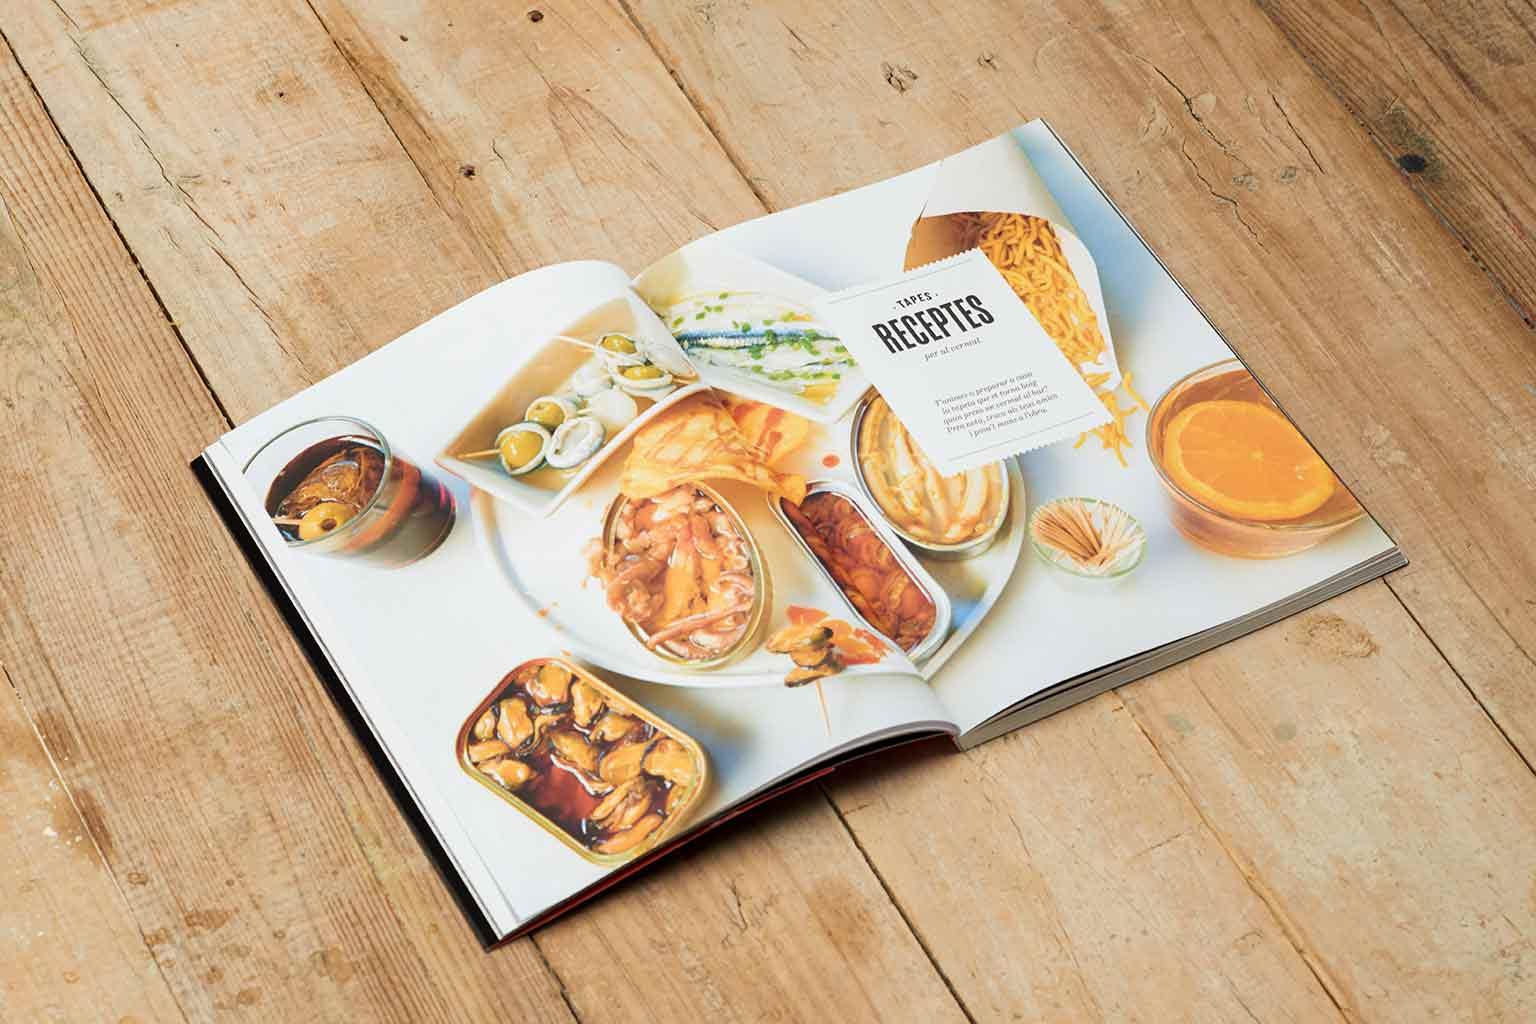 forfood-libro-vermut-editorial-receta-fotografia